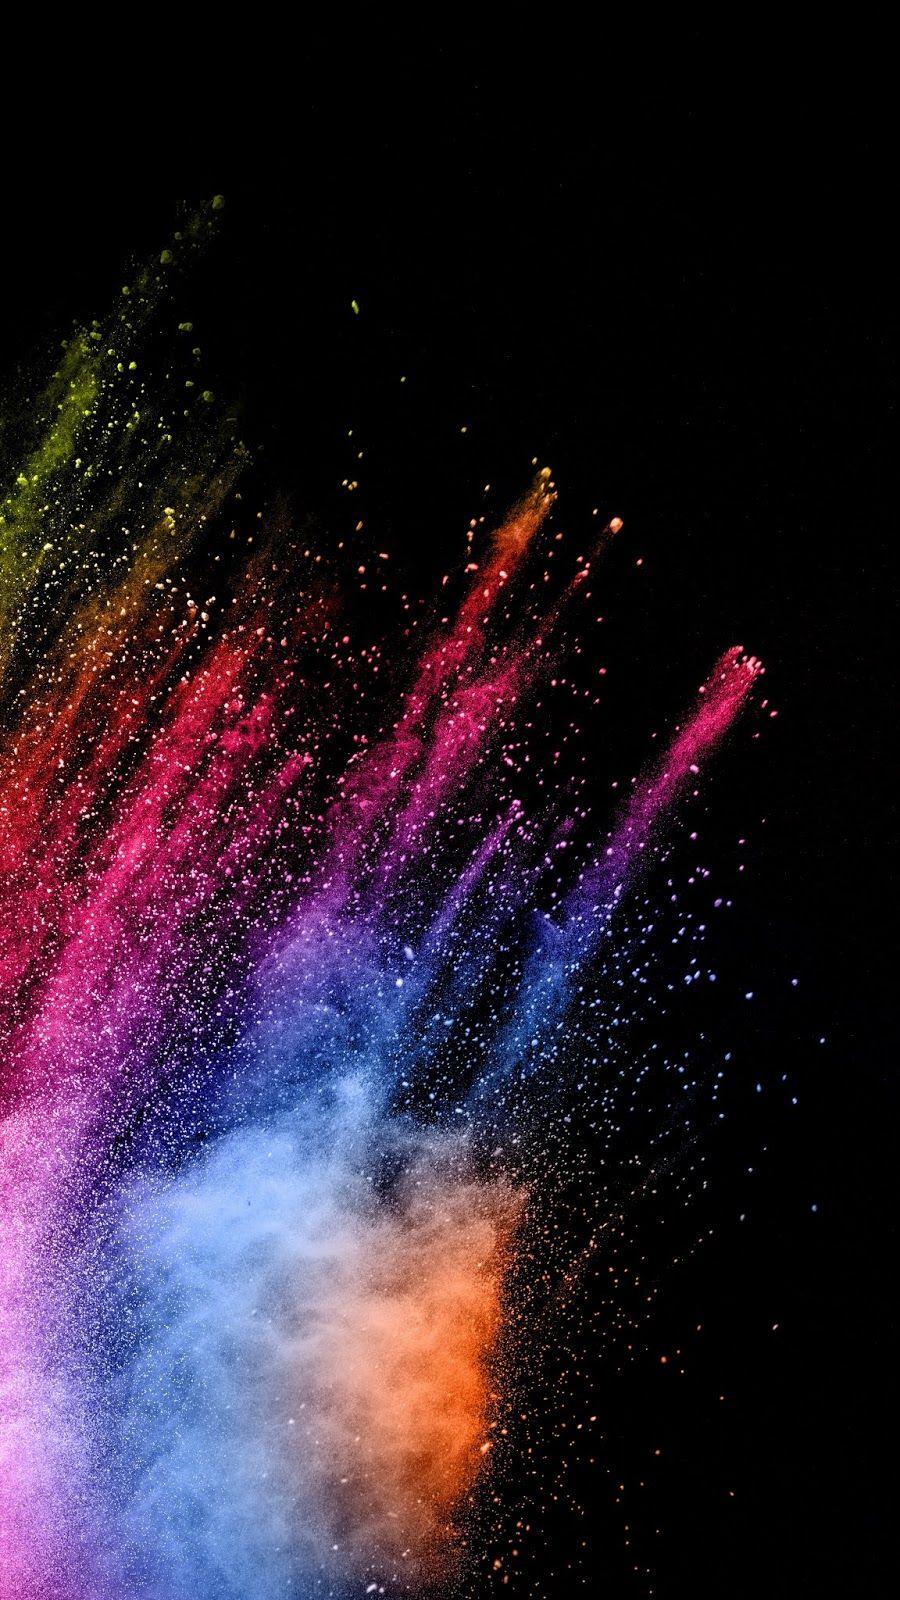 Colorful explosion beautiful wallpaper bright - Explosion wallpaper ...